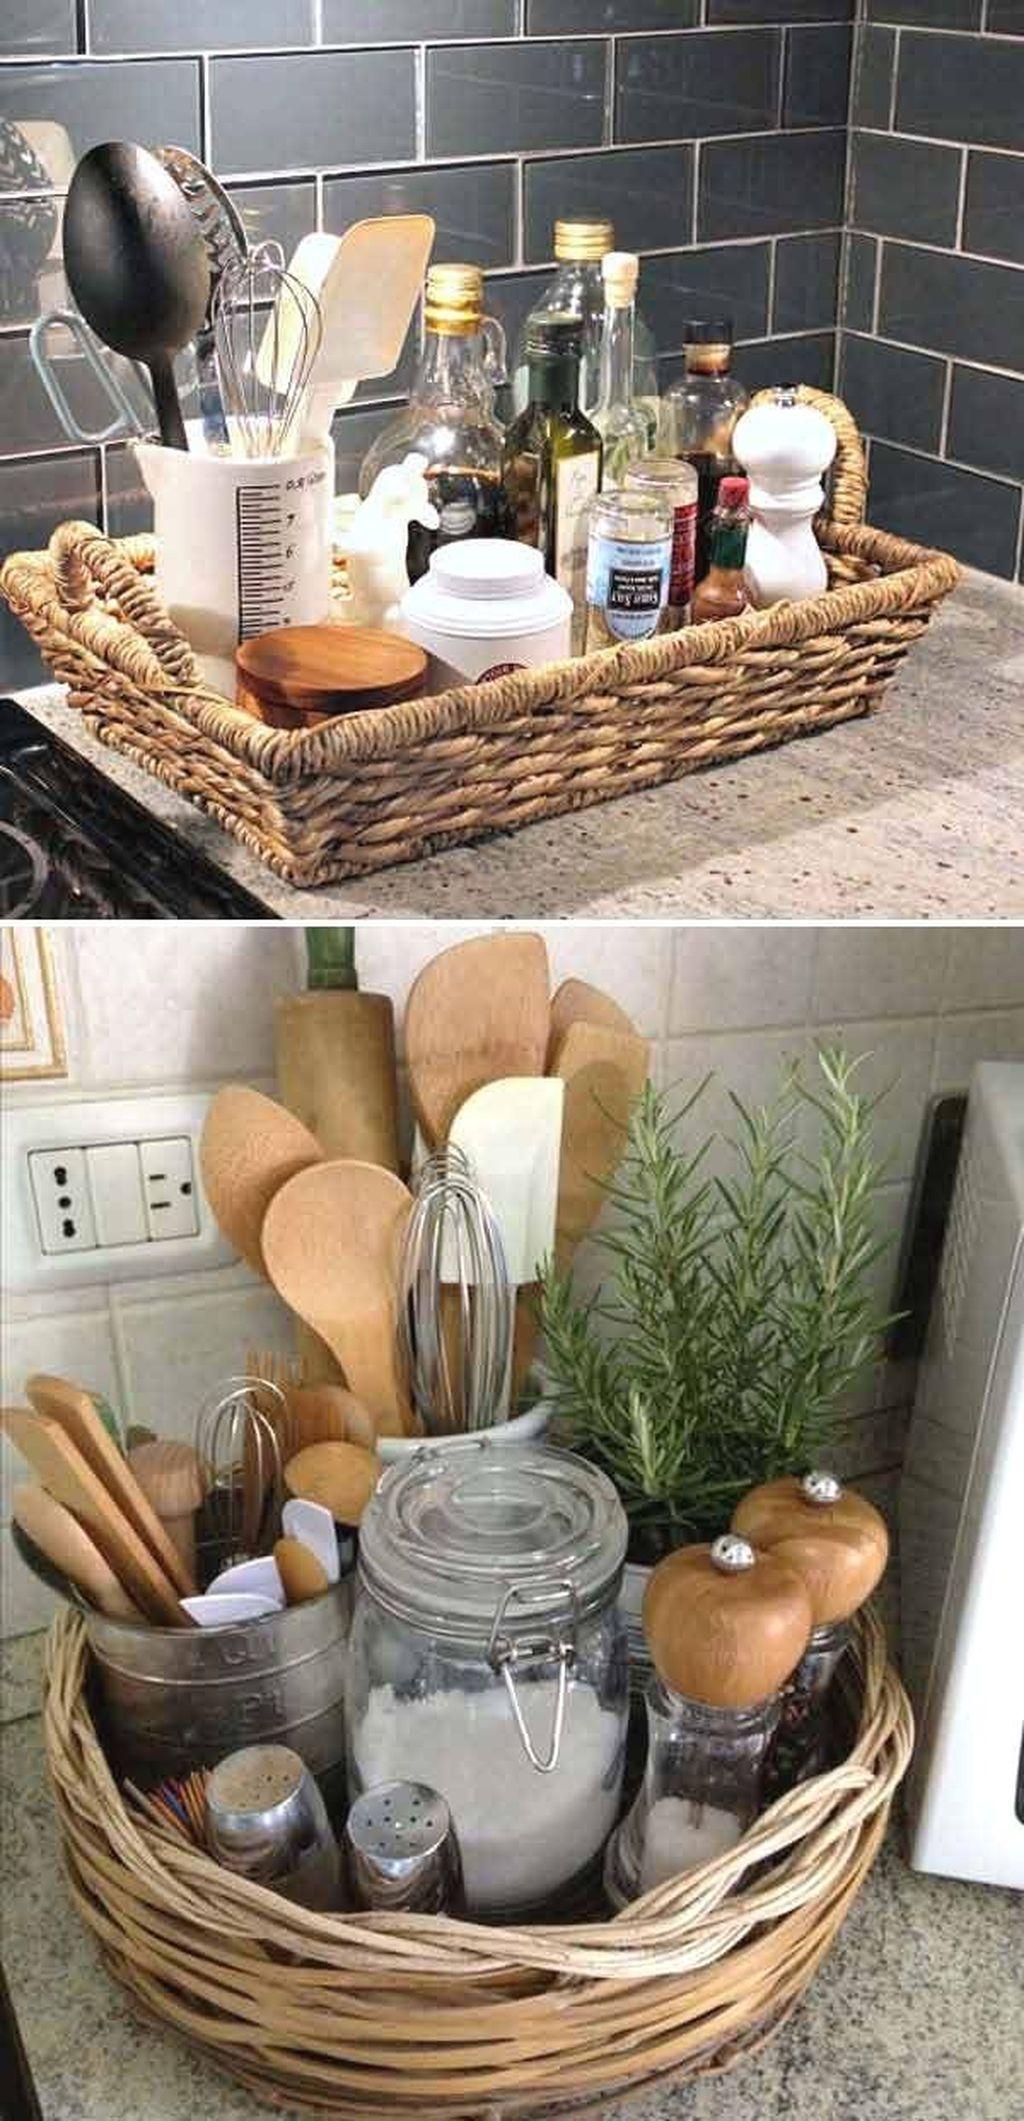 37 Enchanting Kitchen Organization Ideas Clutter Free Kitchen Countertops Clutter Free Kitchen Kitchen Decor